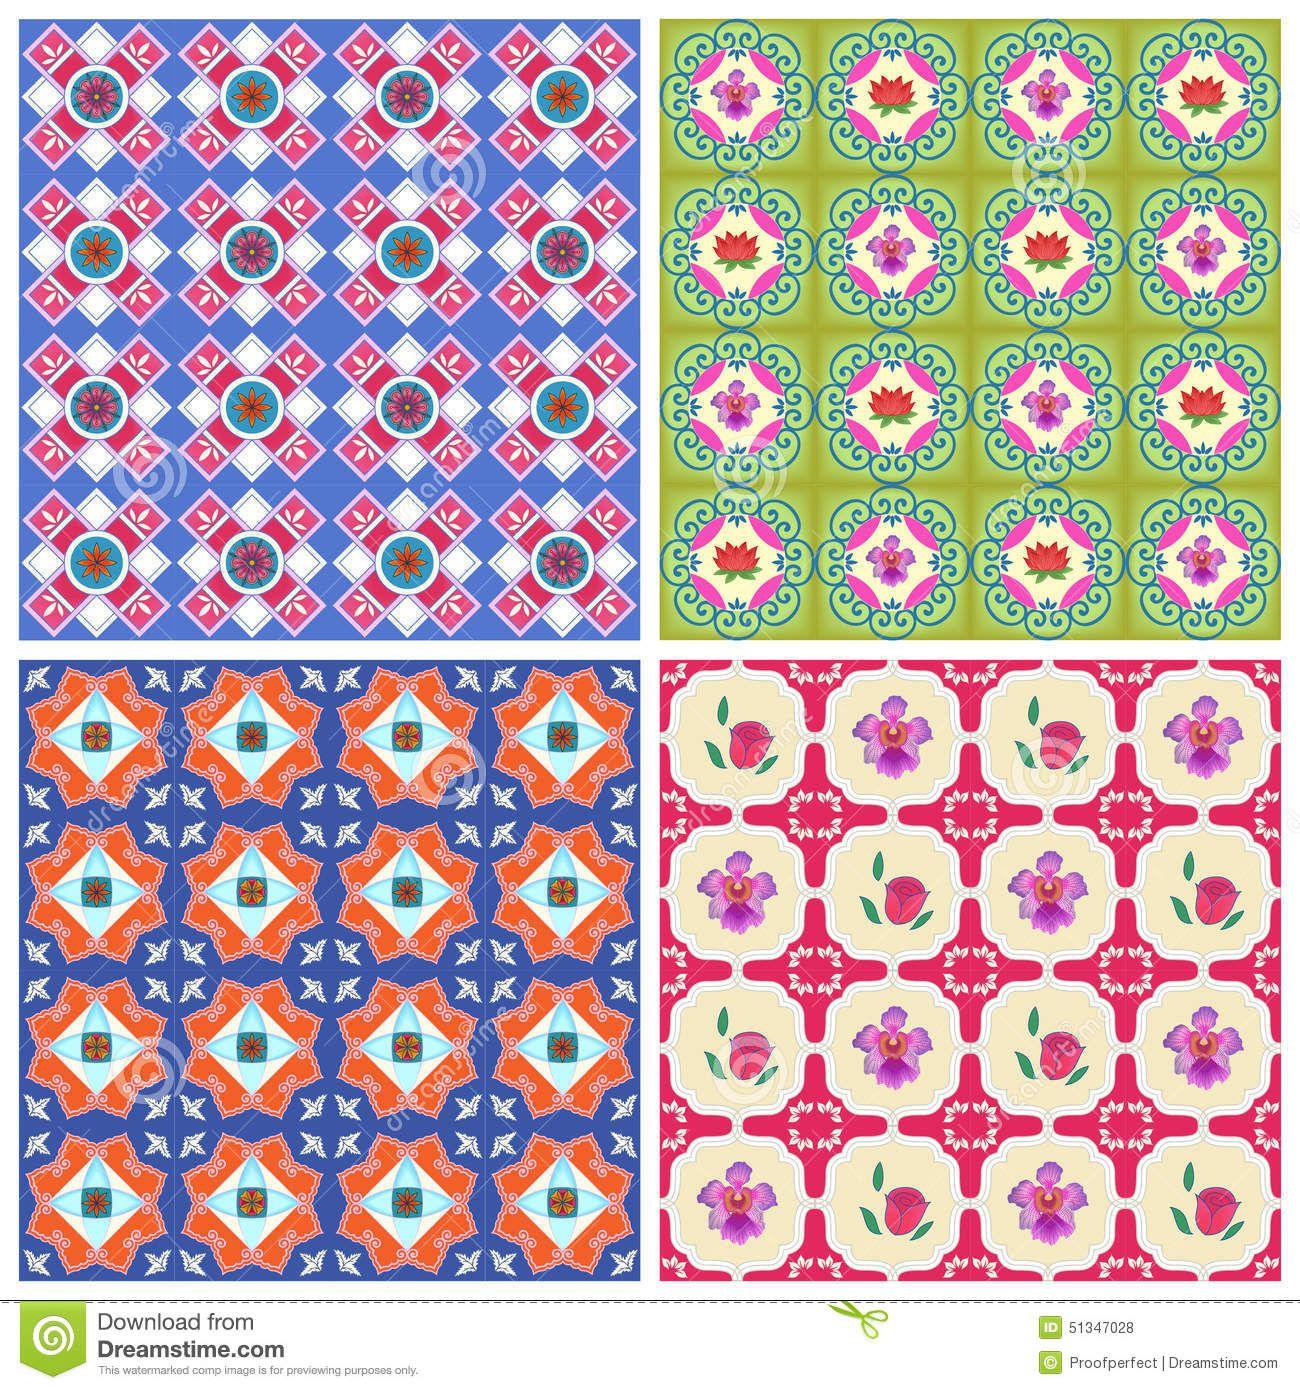 Peranakan Tiles - Google Search